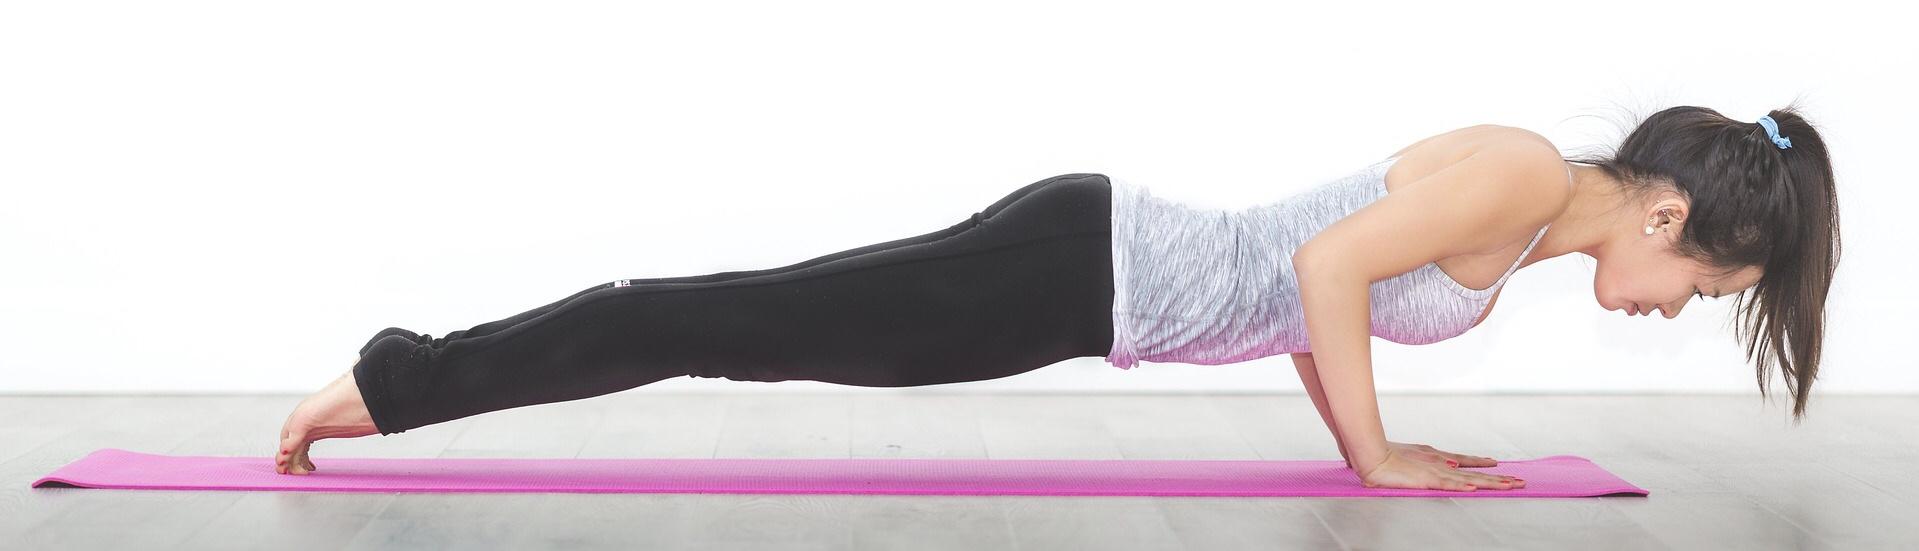 Yoga pilago